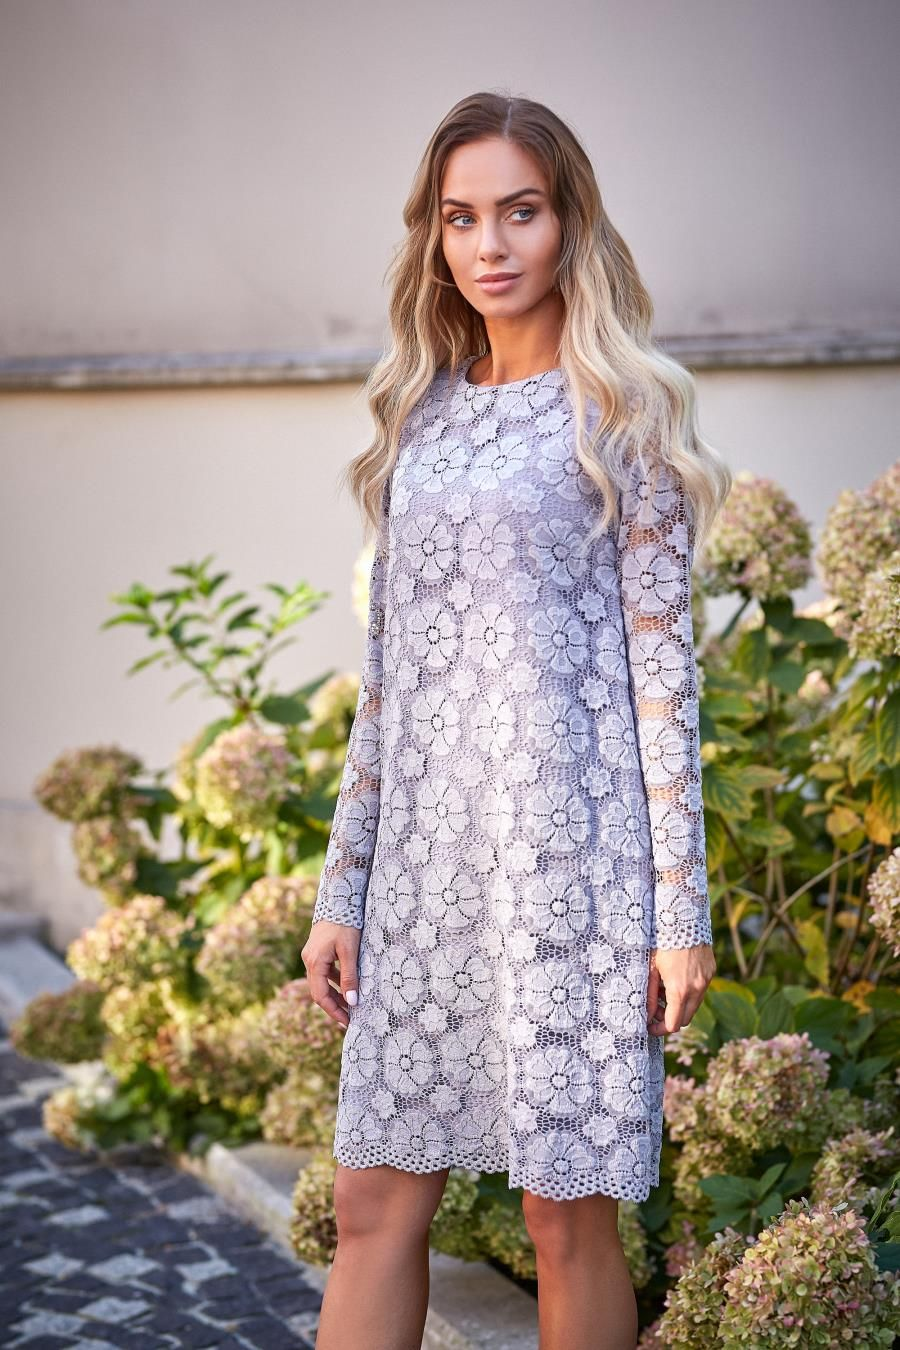 766d06bad3cec5 Koronkowa Sukienka Trapezowa Szara MO406 w 2019 | Sukienka, Sukienki ...